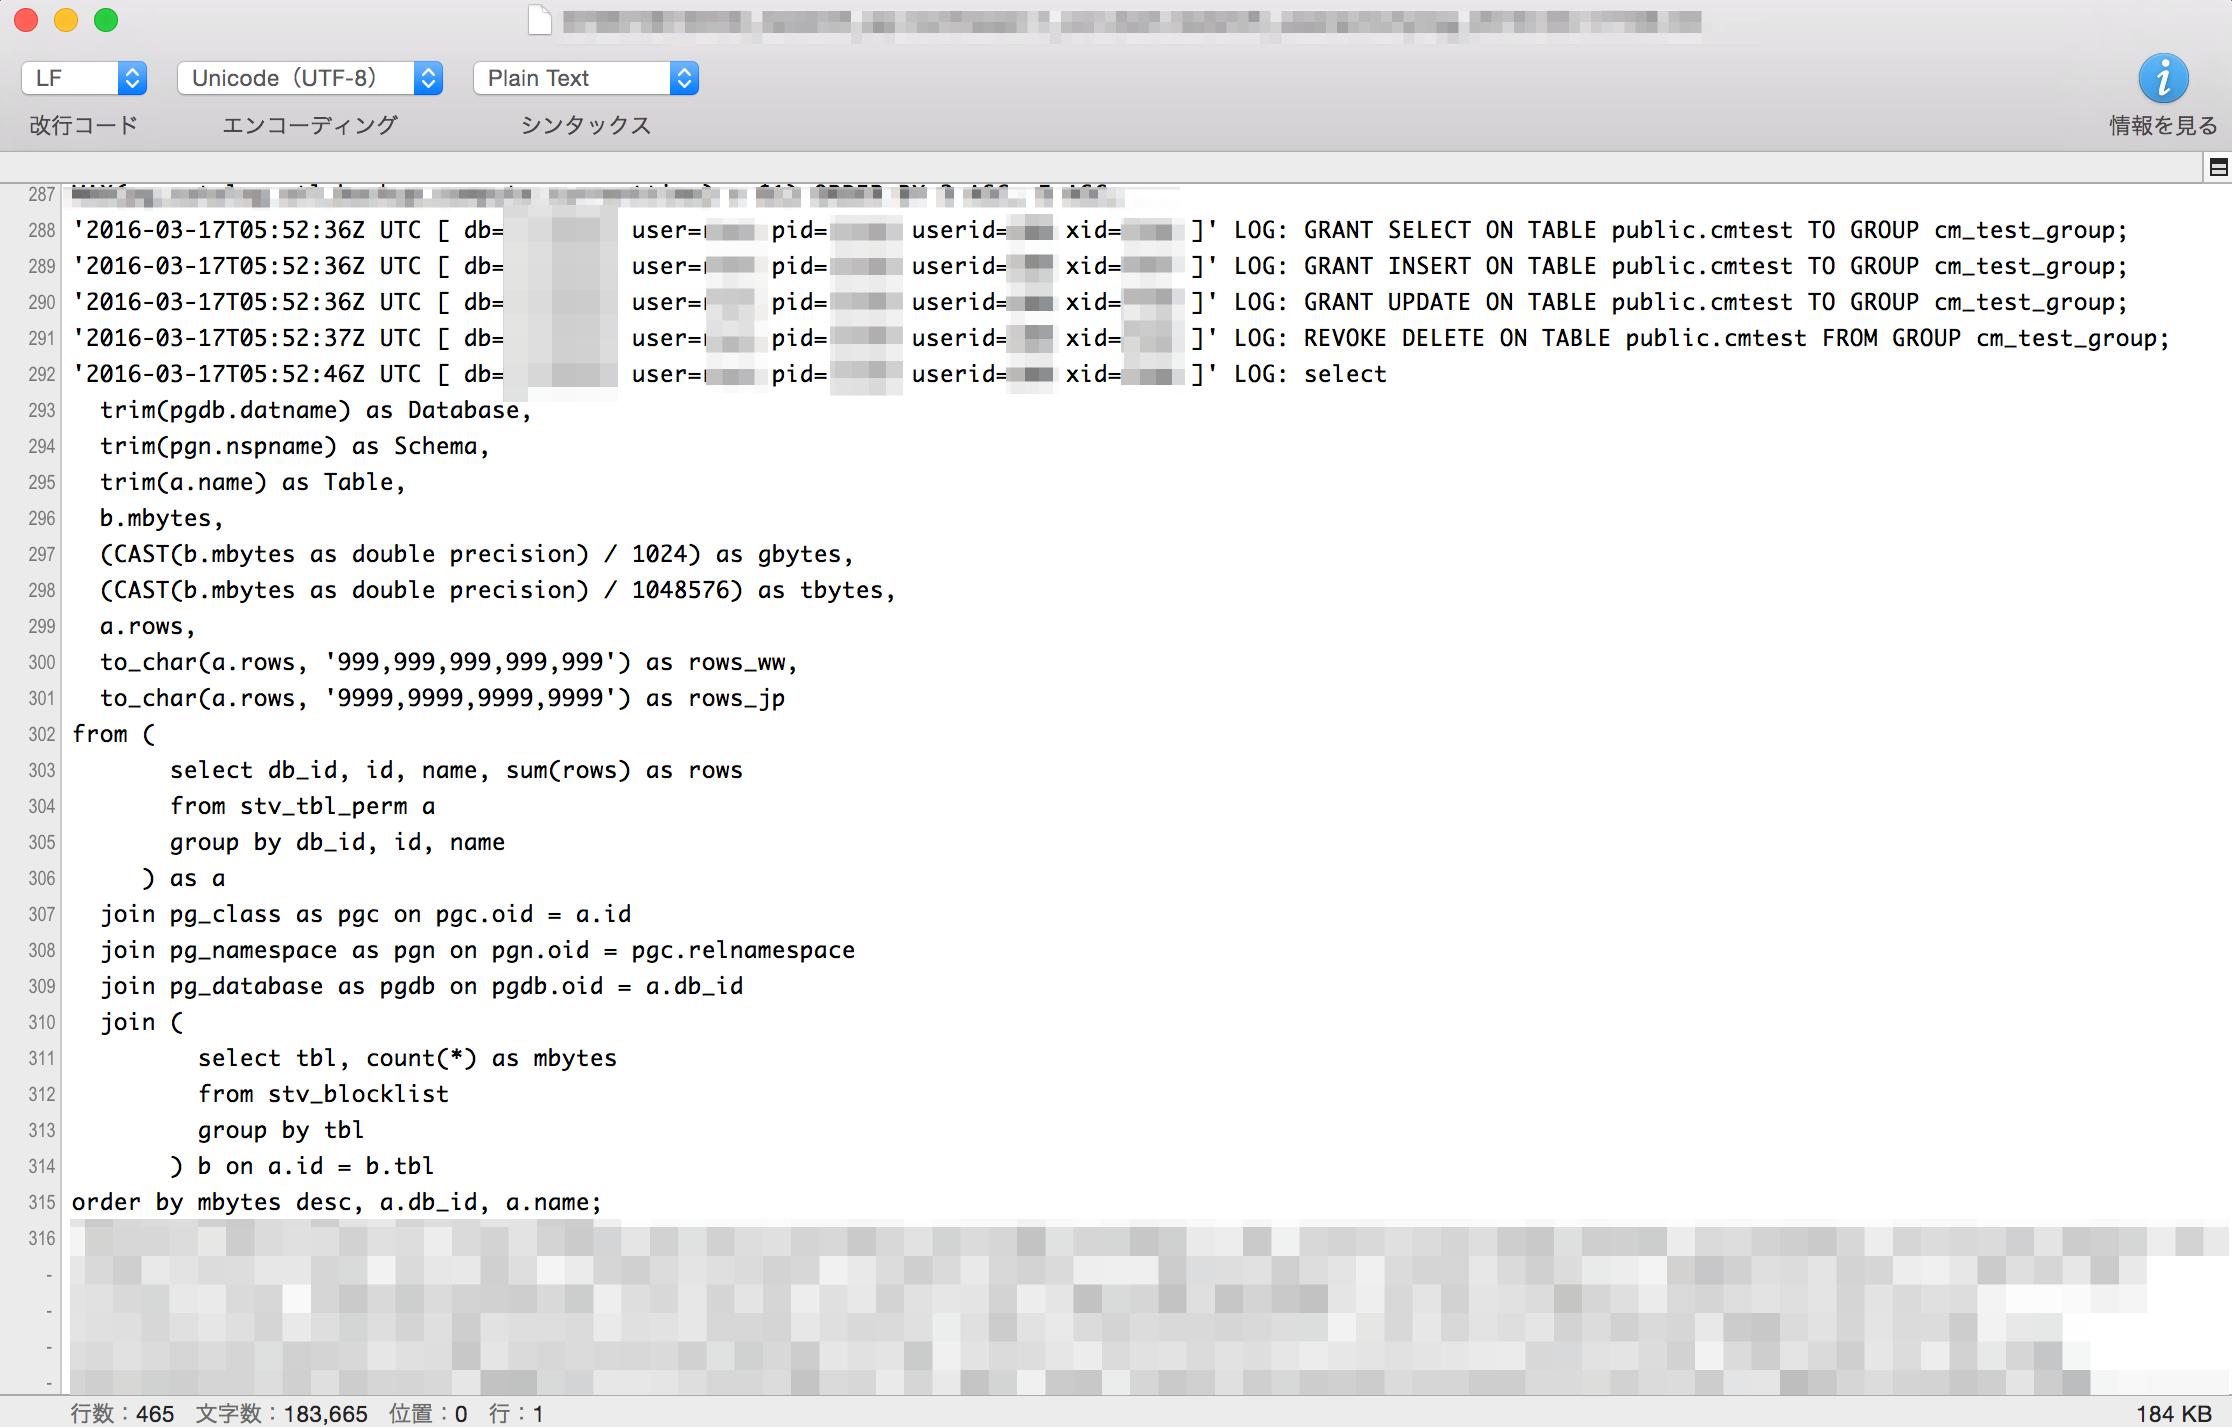 redshift_user_activity_log_01